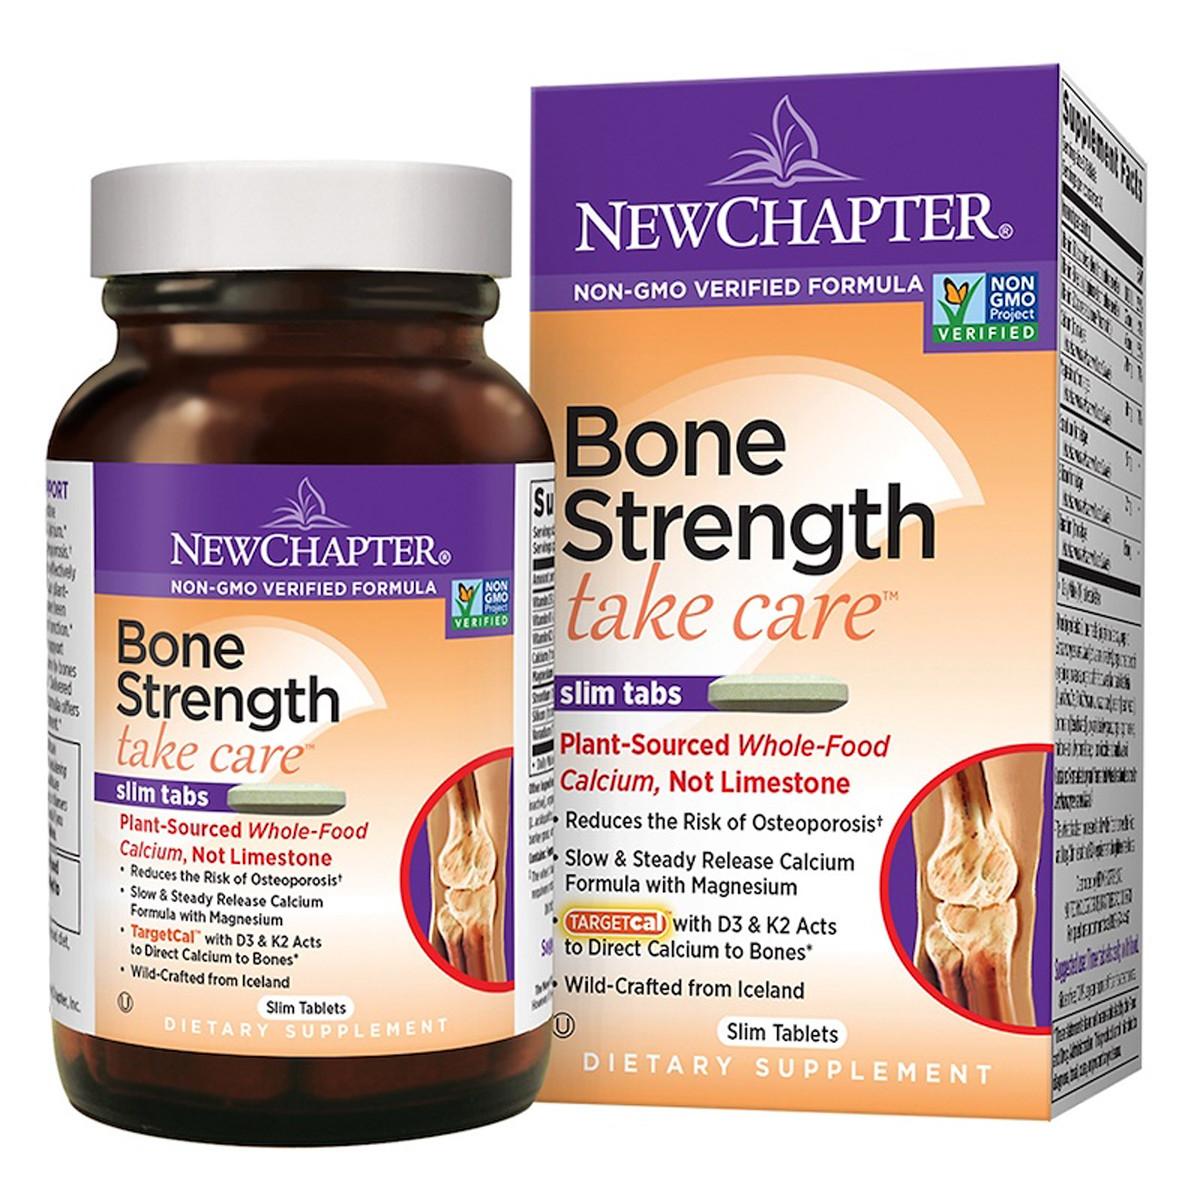 Комплекс для для укрепления костей, Bone Strength Take Care, New Chapter, 60 таблеток